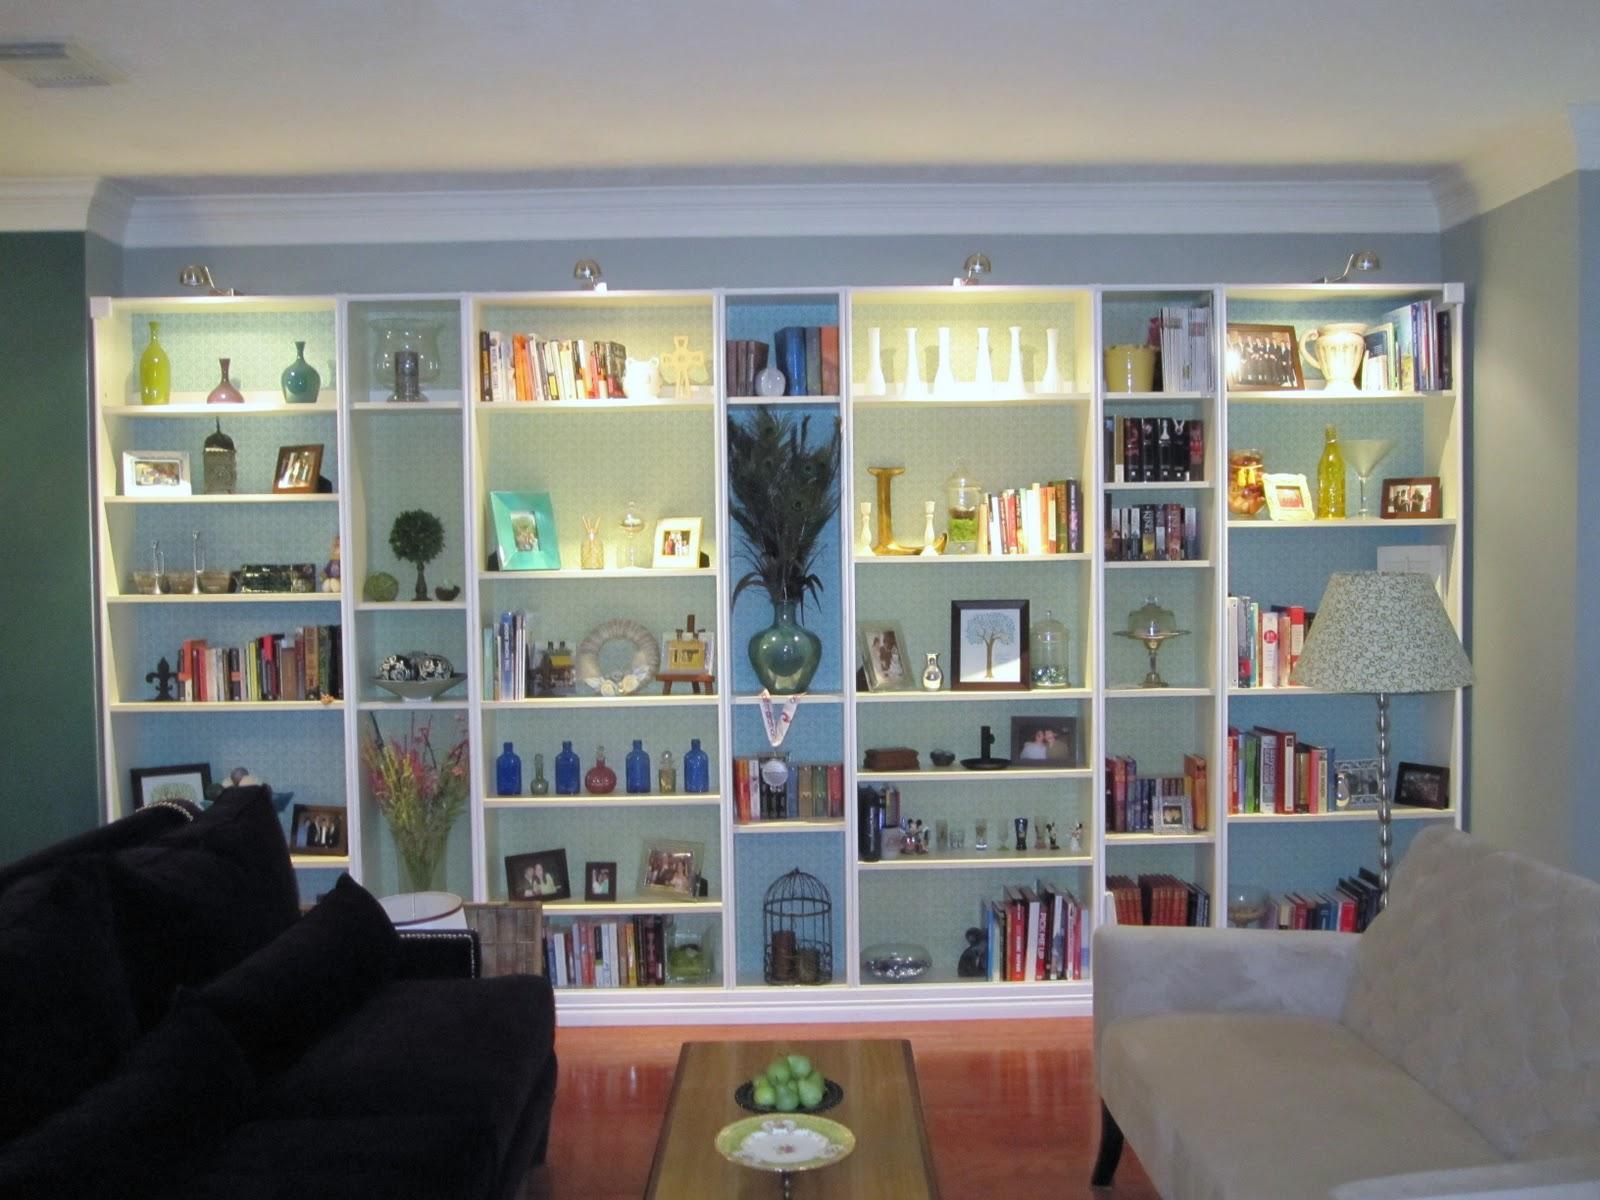 Ikea Hack Bookcase: Lazy Owl Boutique: Ikea Hack: Built-in Bookshelves Tutorial